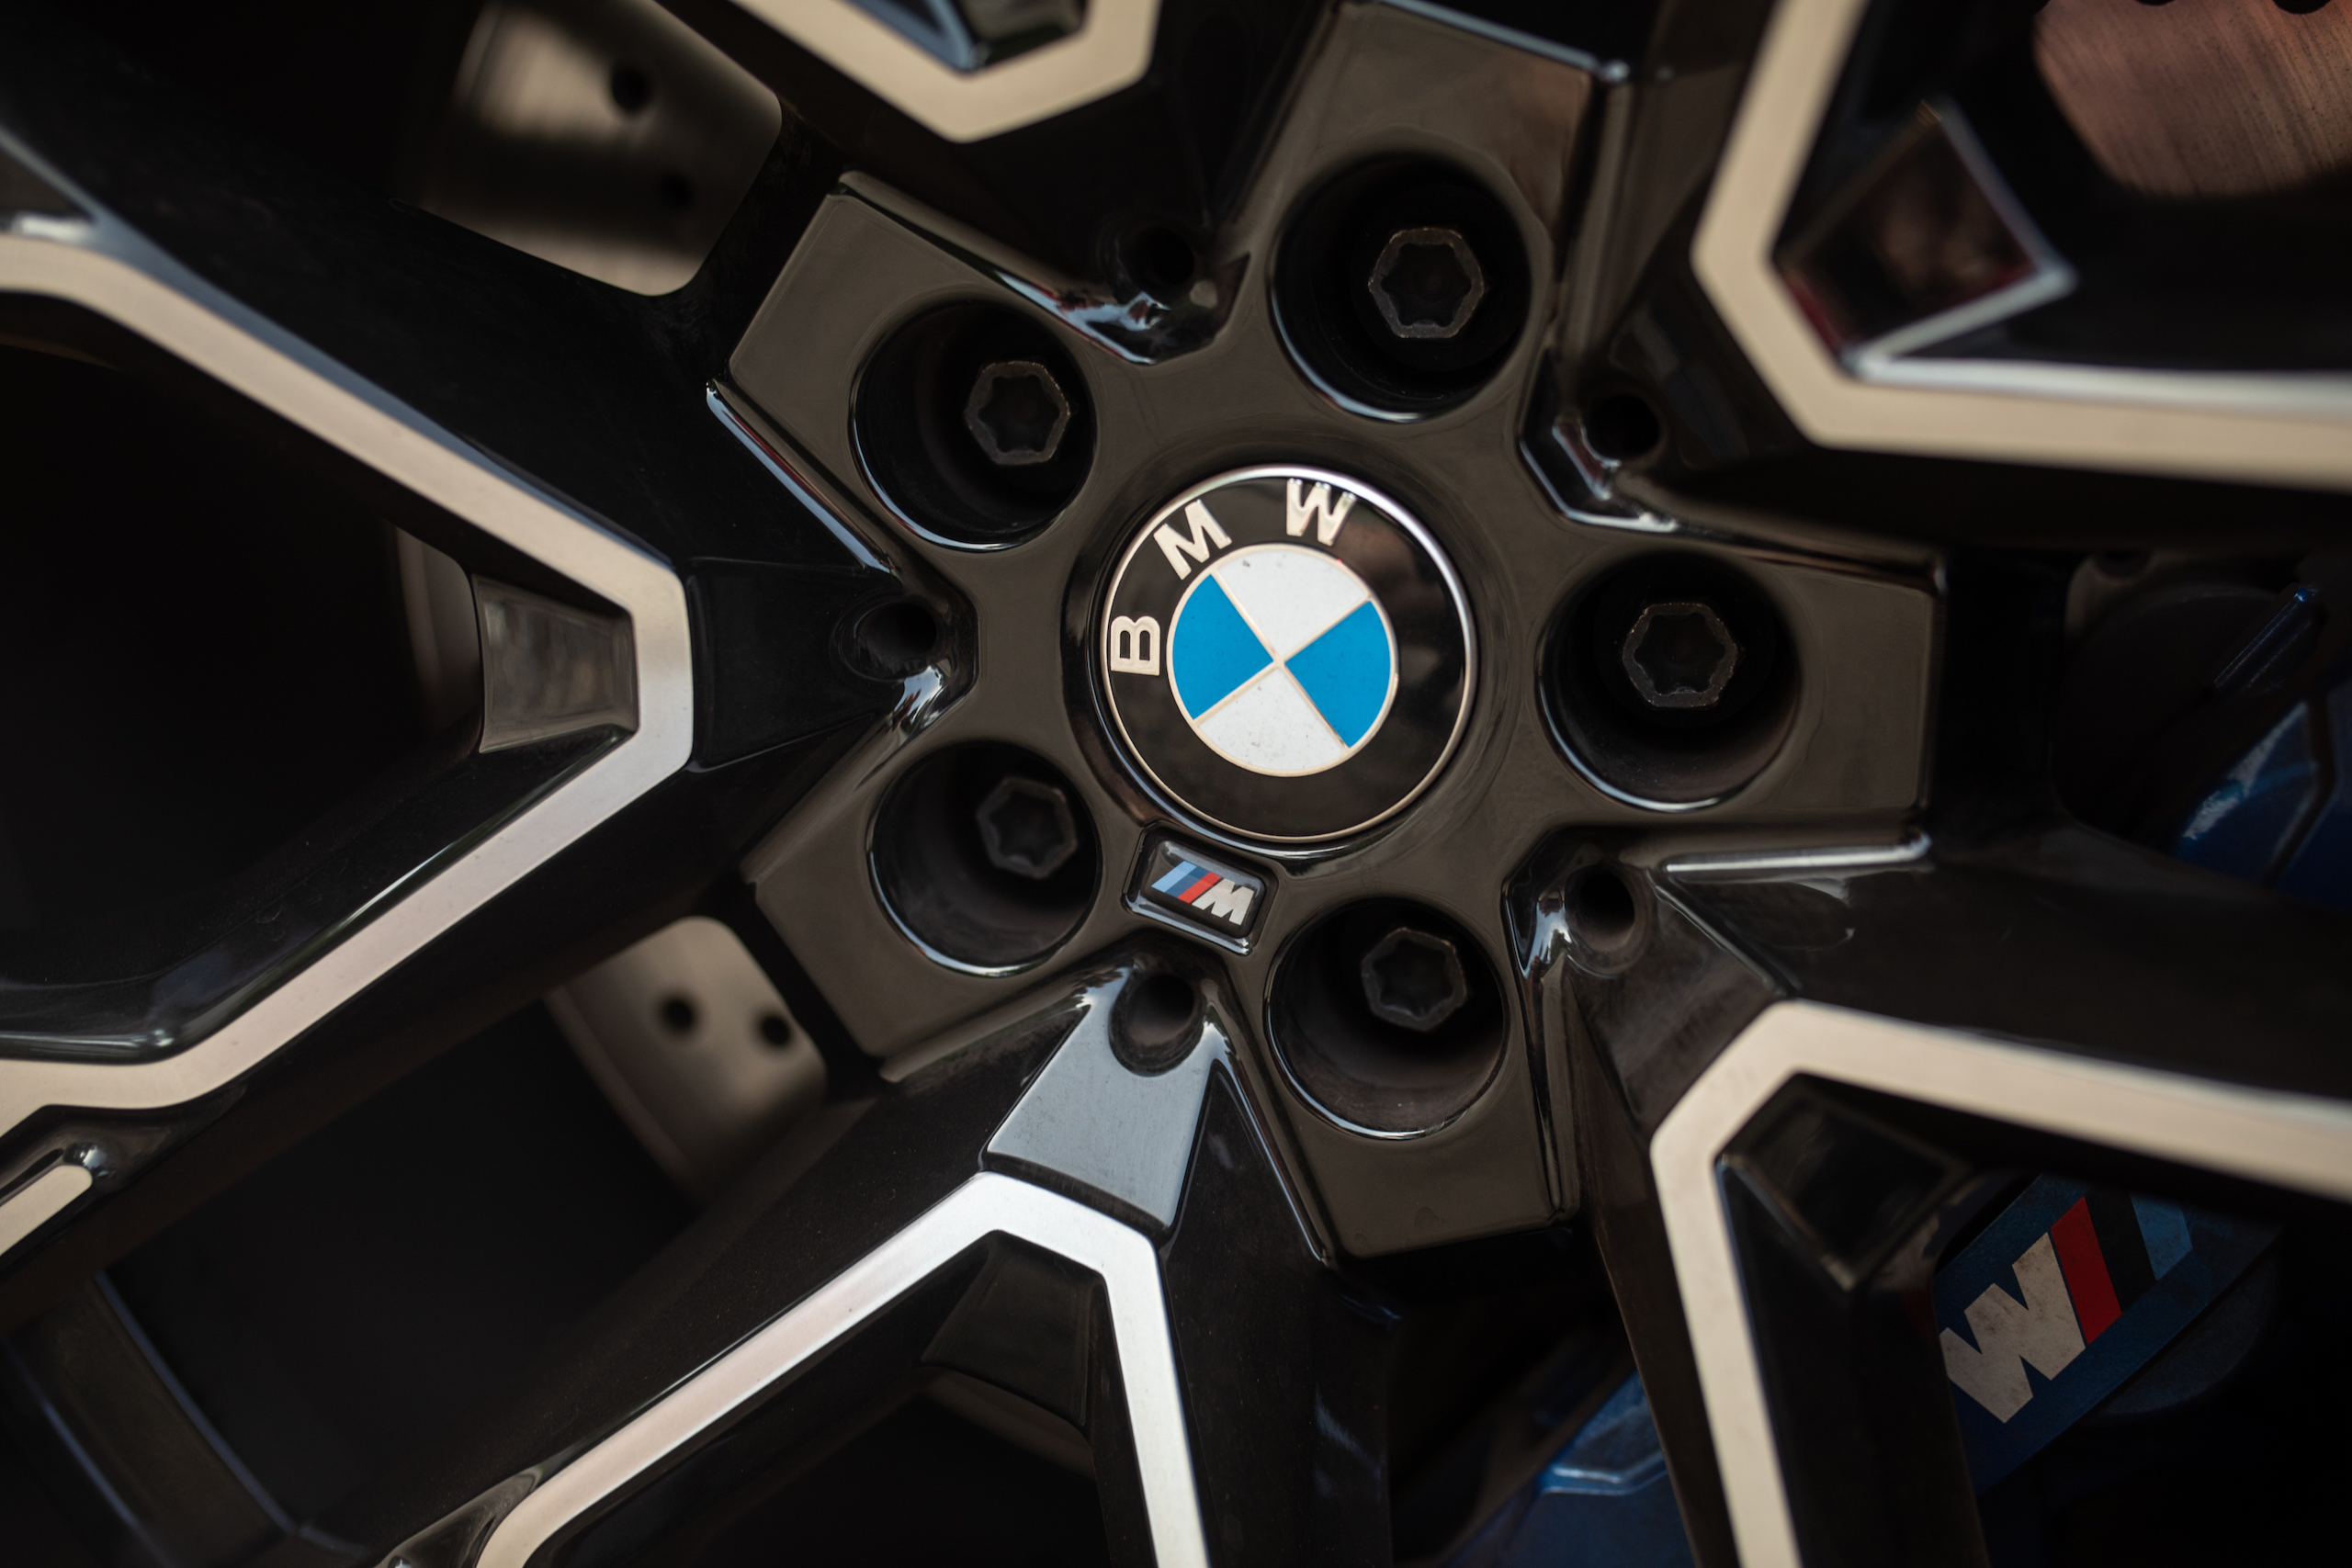 bmw x5m wheel hub detail